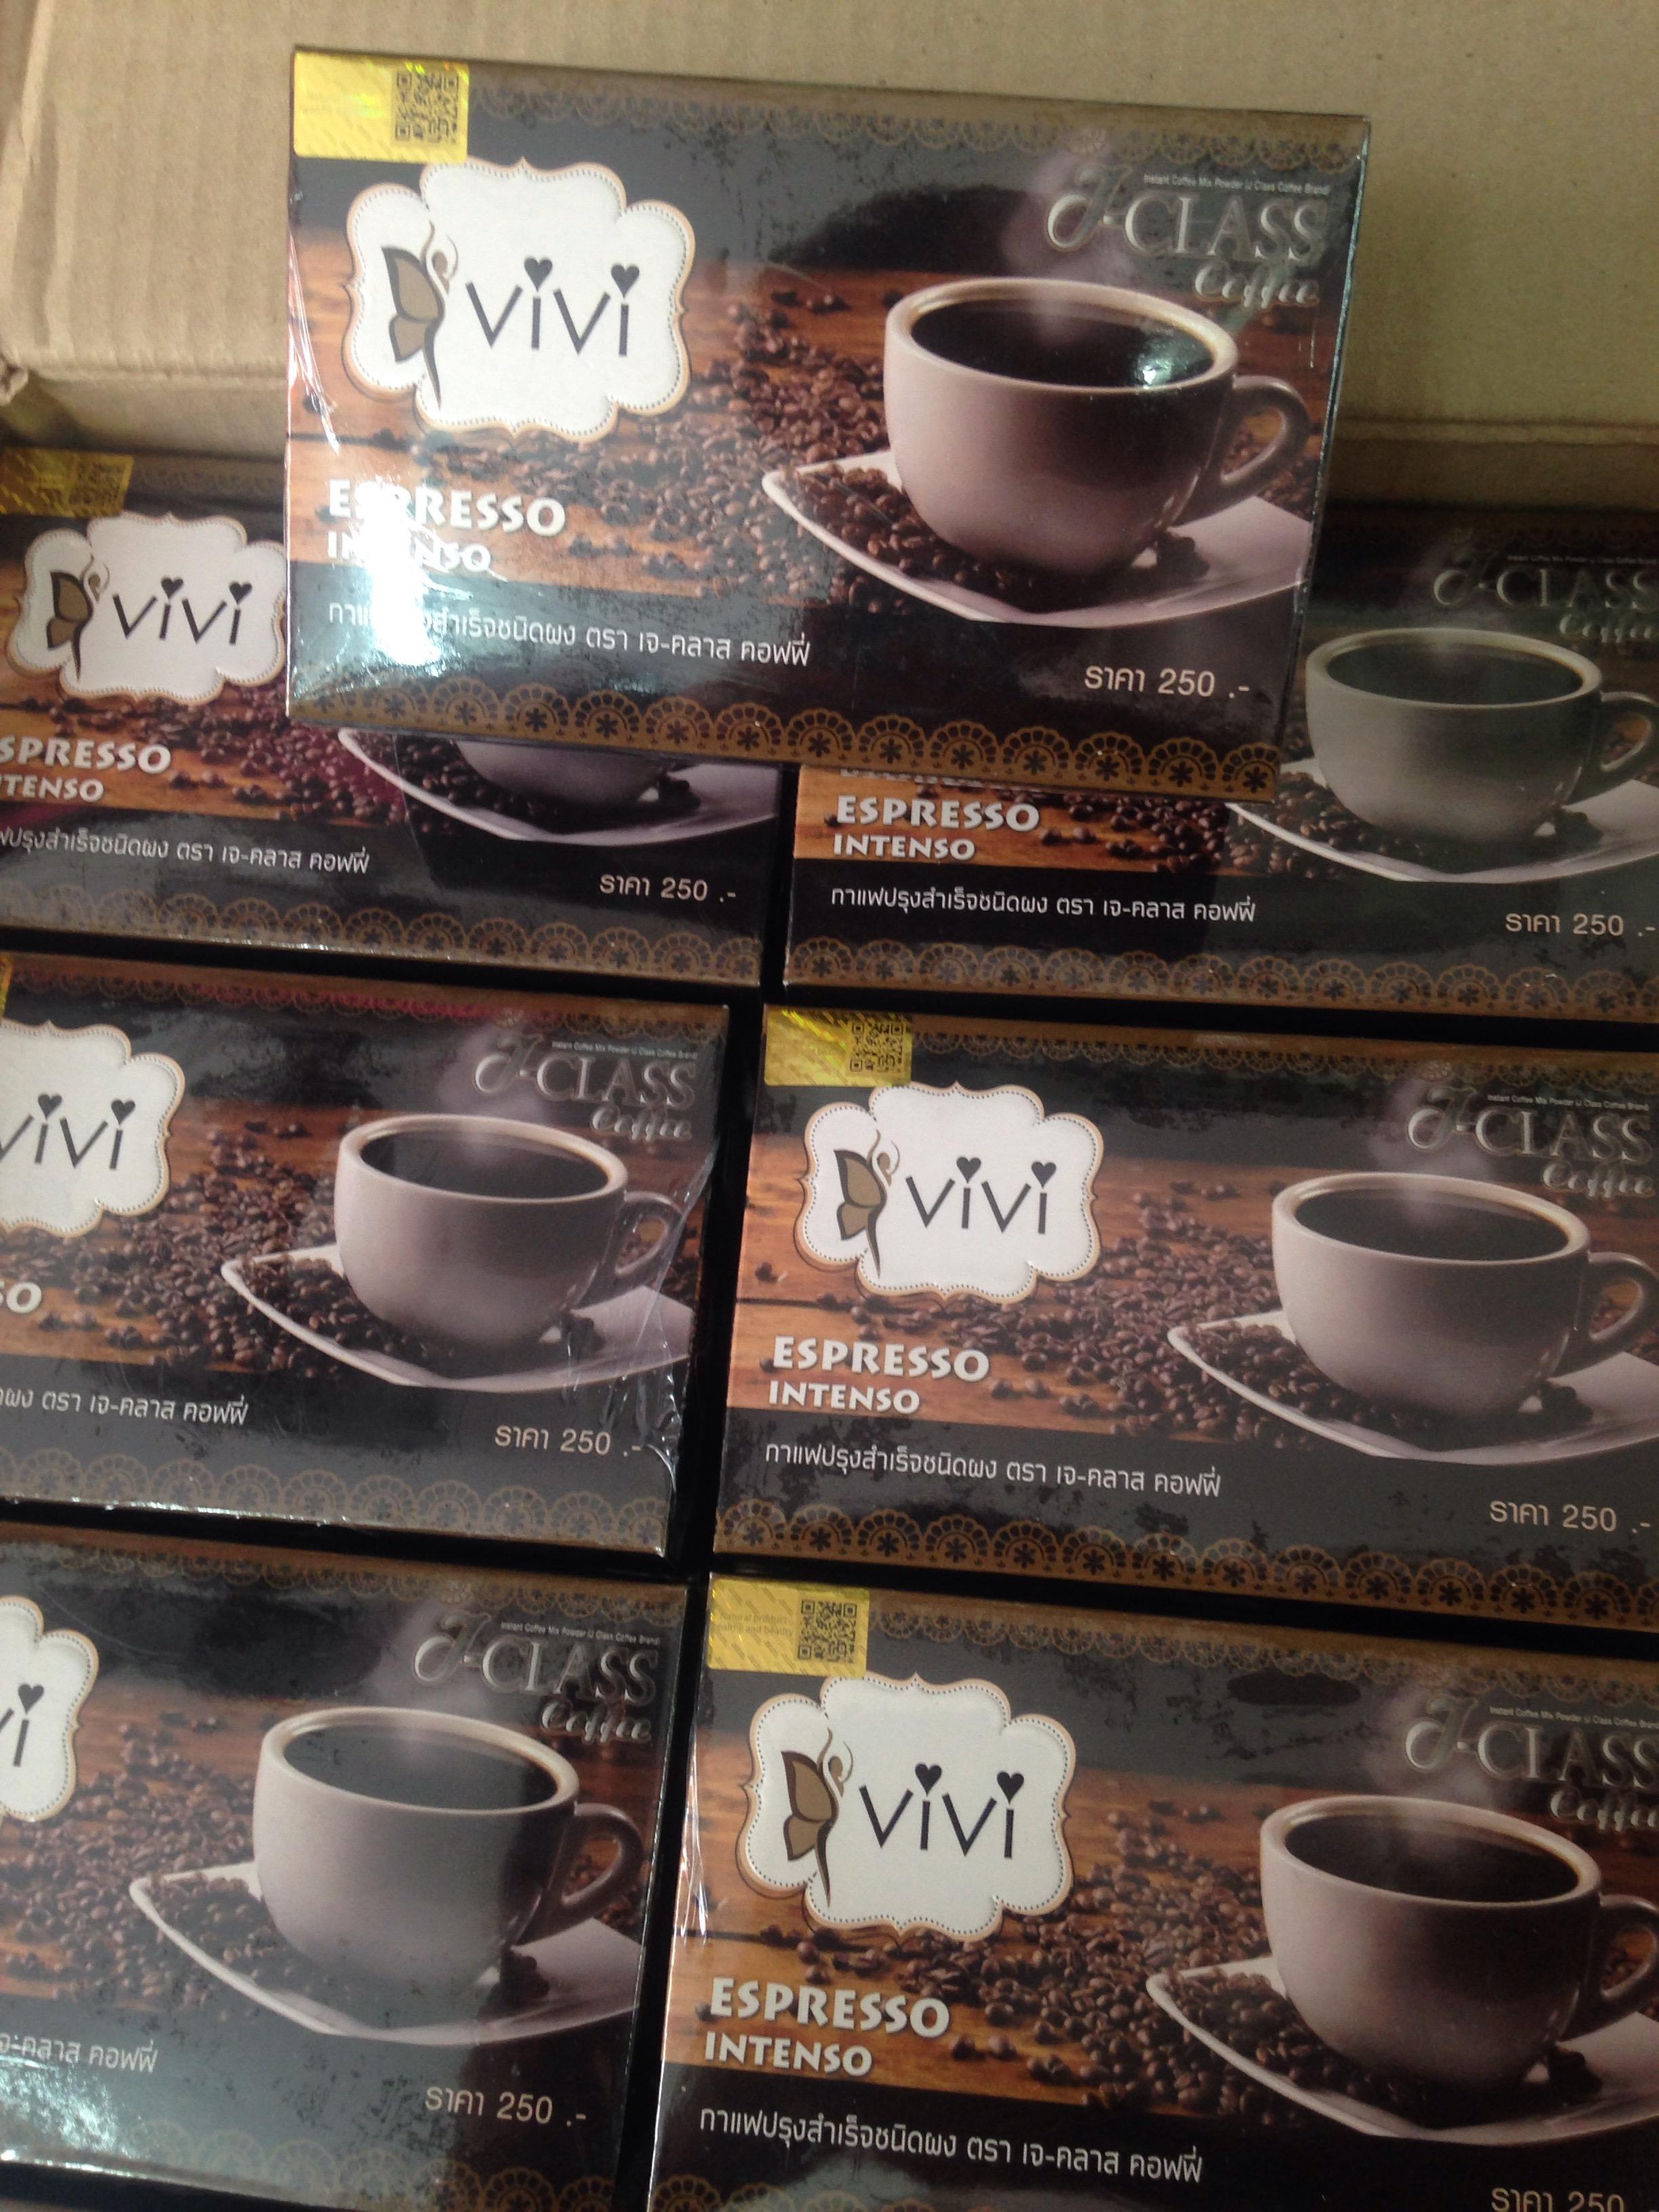 vivi กาแฟดำ ลดความอ้วน Espresso Intenso 10 ซอง